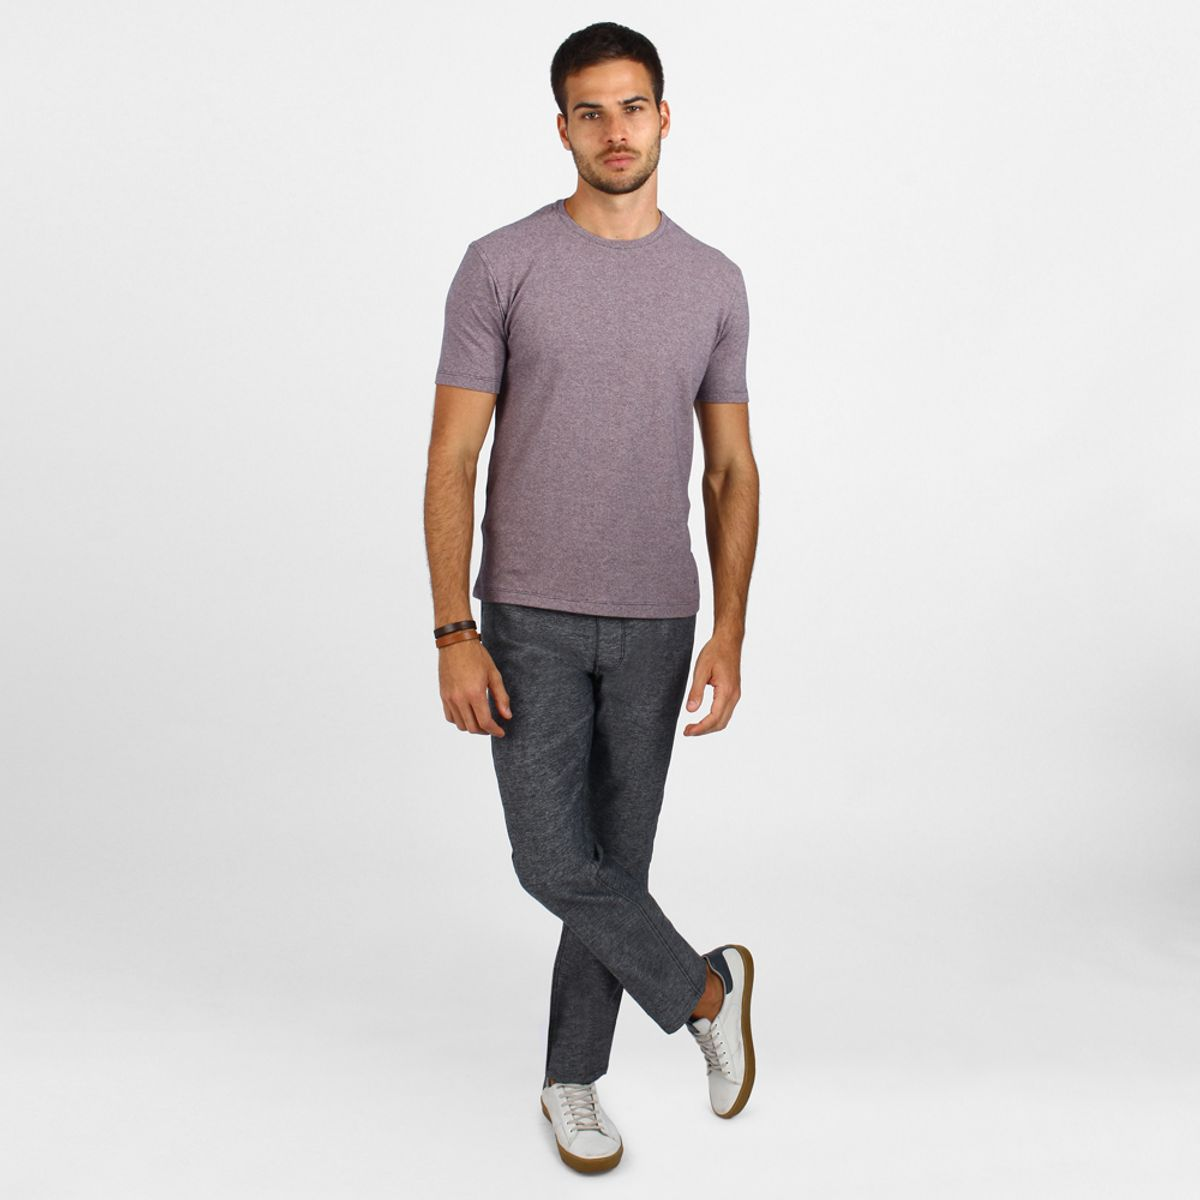 Camiseta-Fio-Binado-Bordeaux